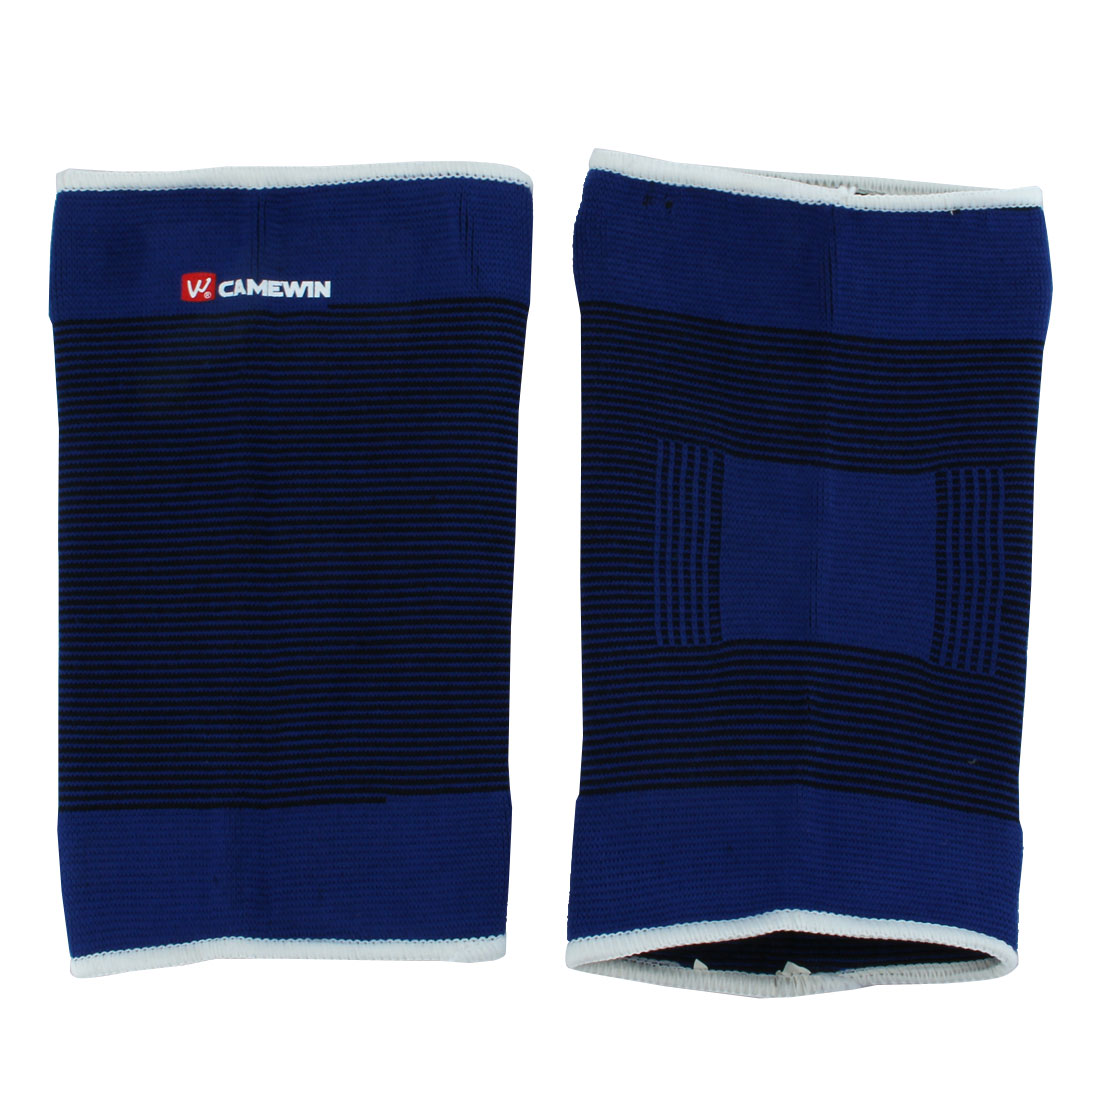 2pcs Thigh Leg Support Elastic Protect Brace Sleeve Sport Hiking Bandage